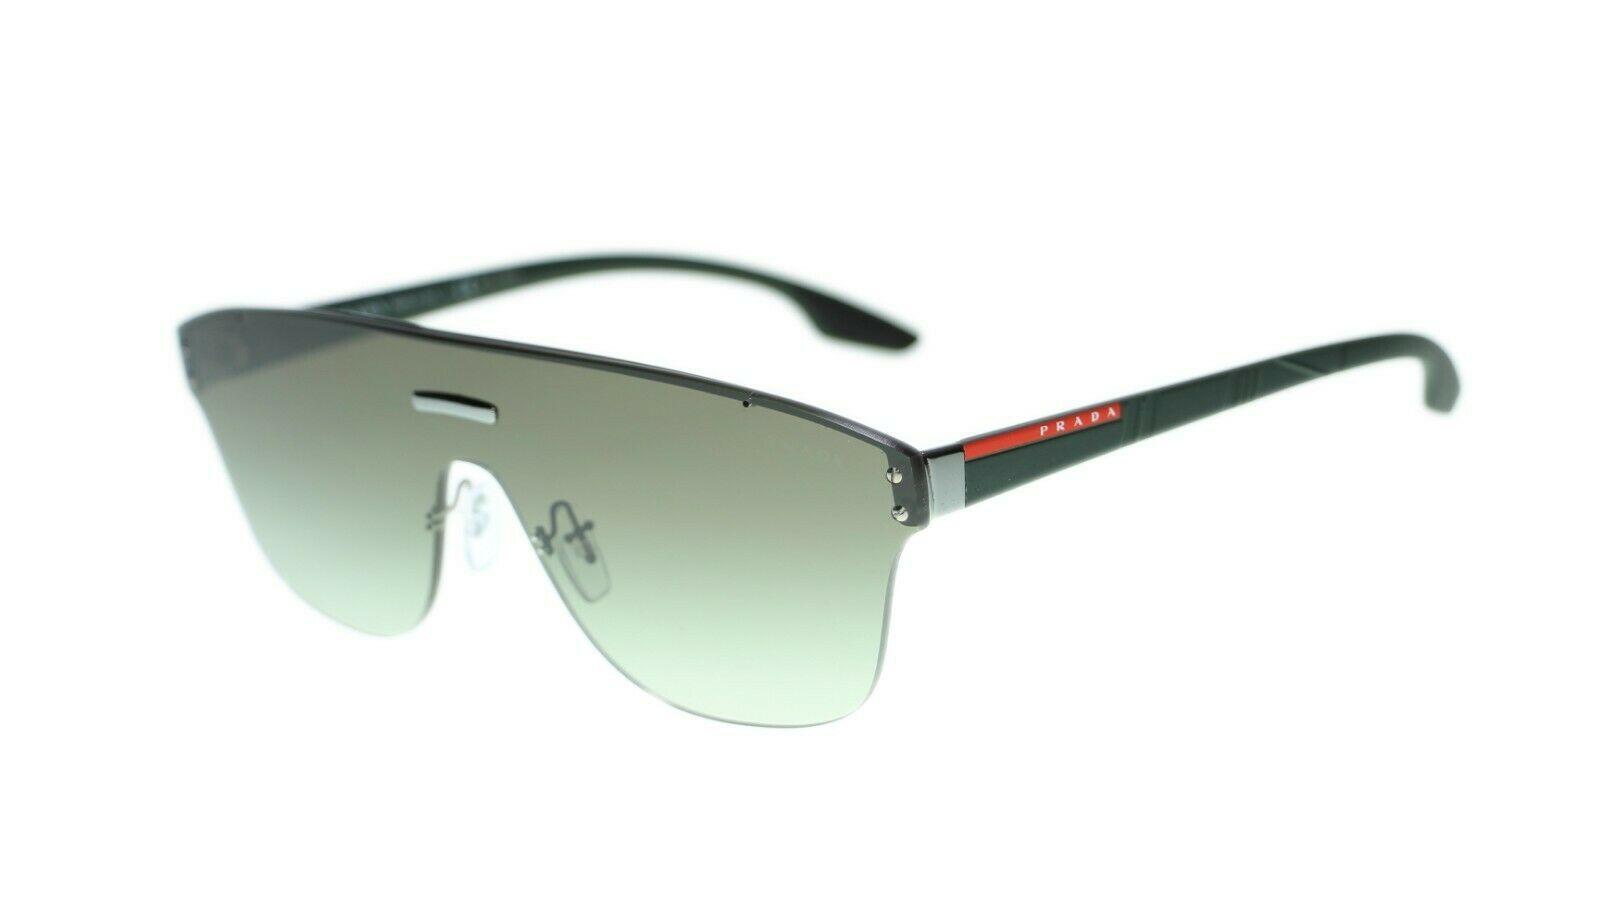 Prada Men Sunglasses PS57TS Linea Rossa 43mm Authentic